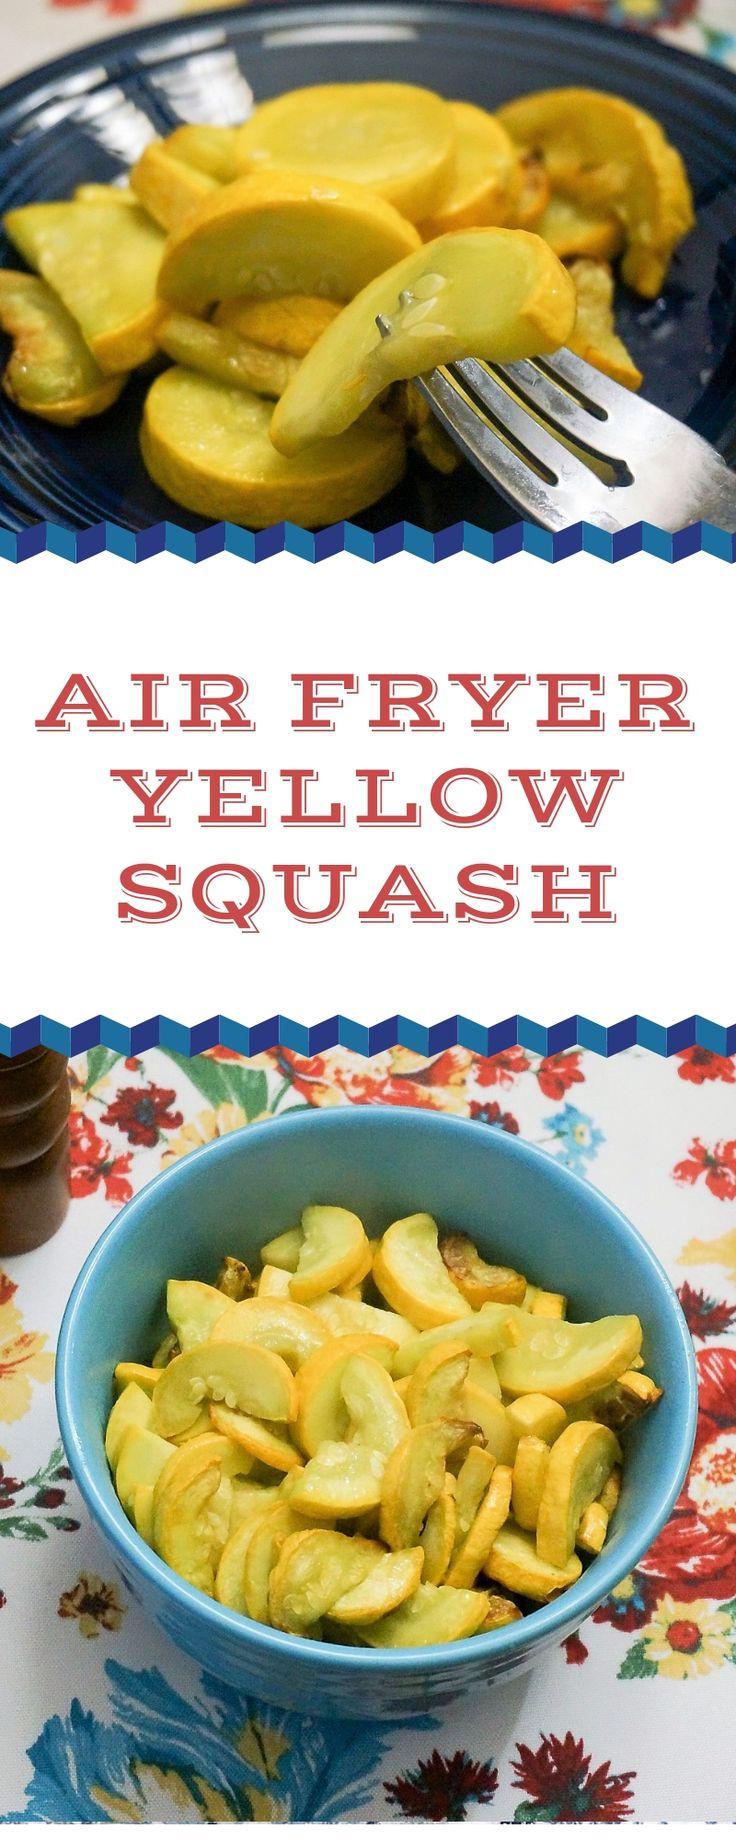 Air Fryer Yellow Squash